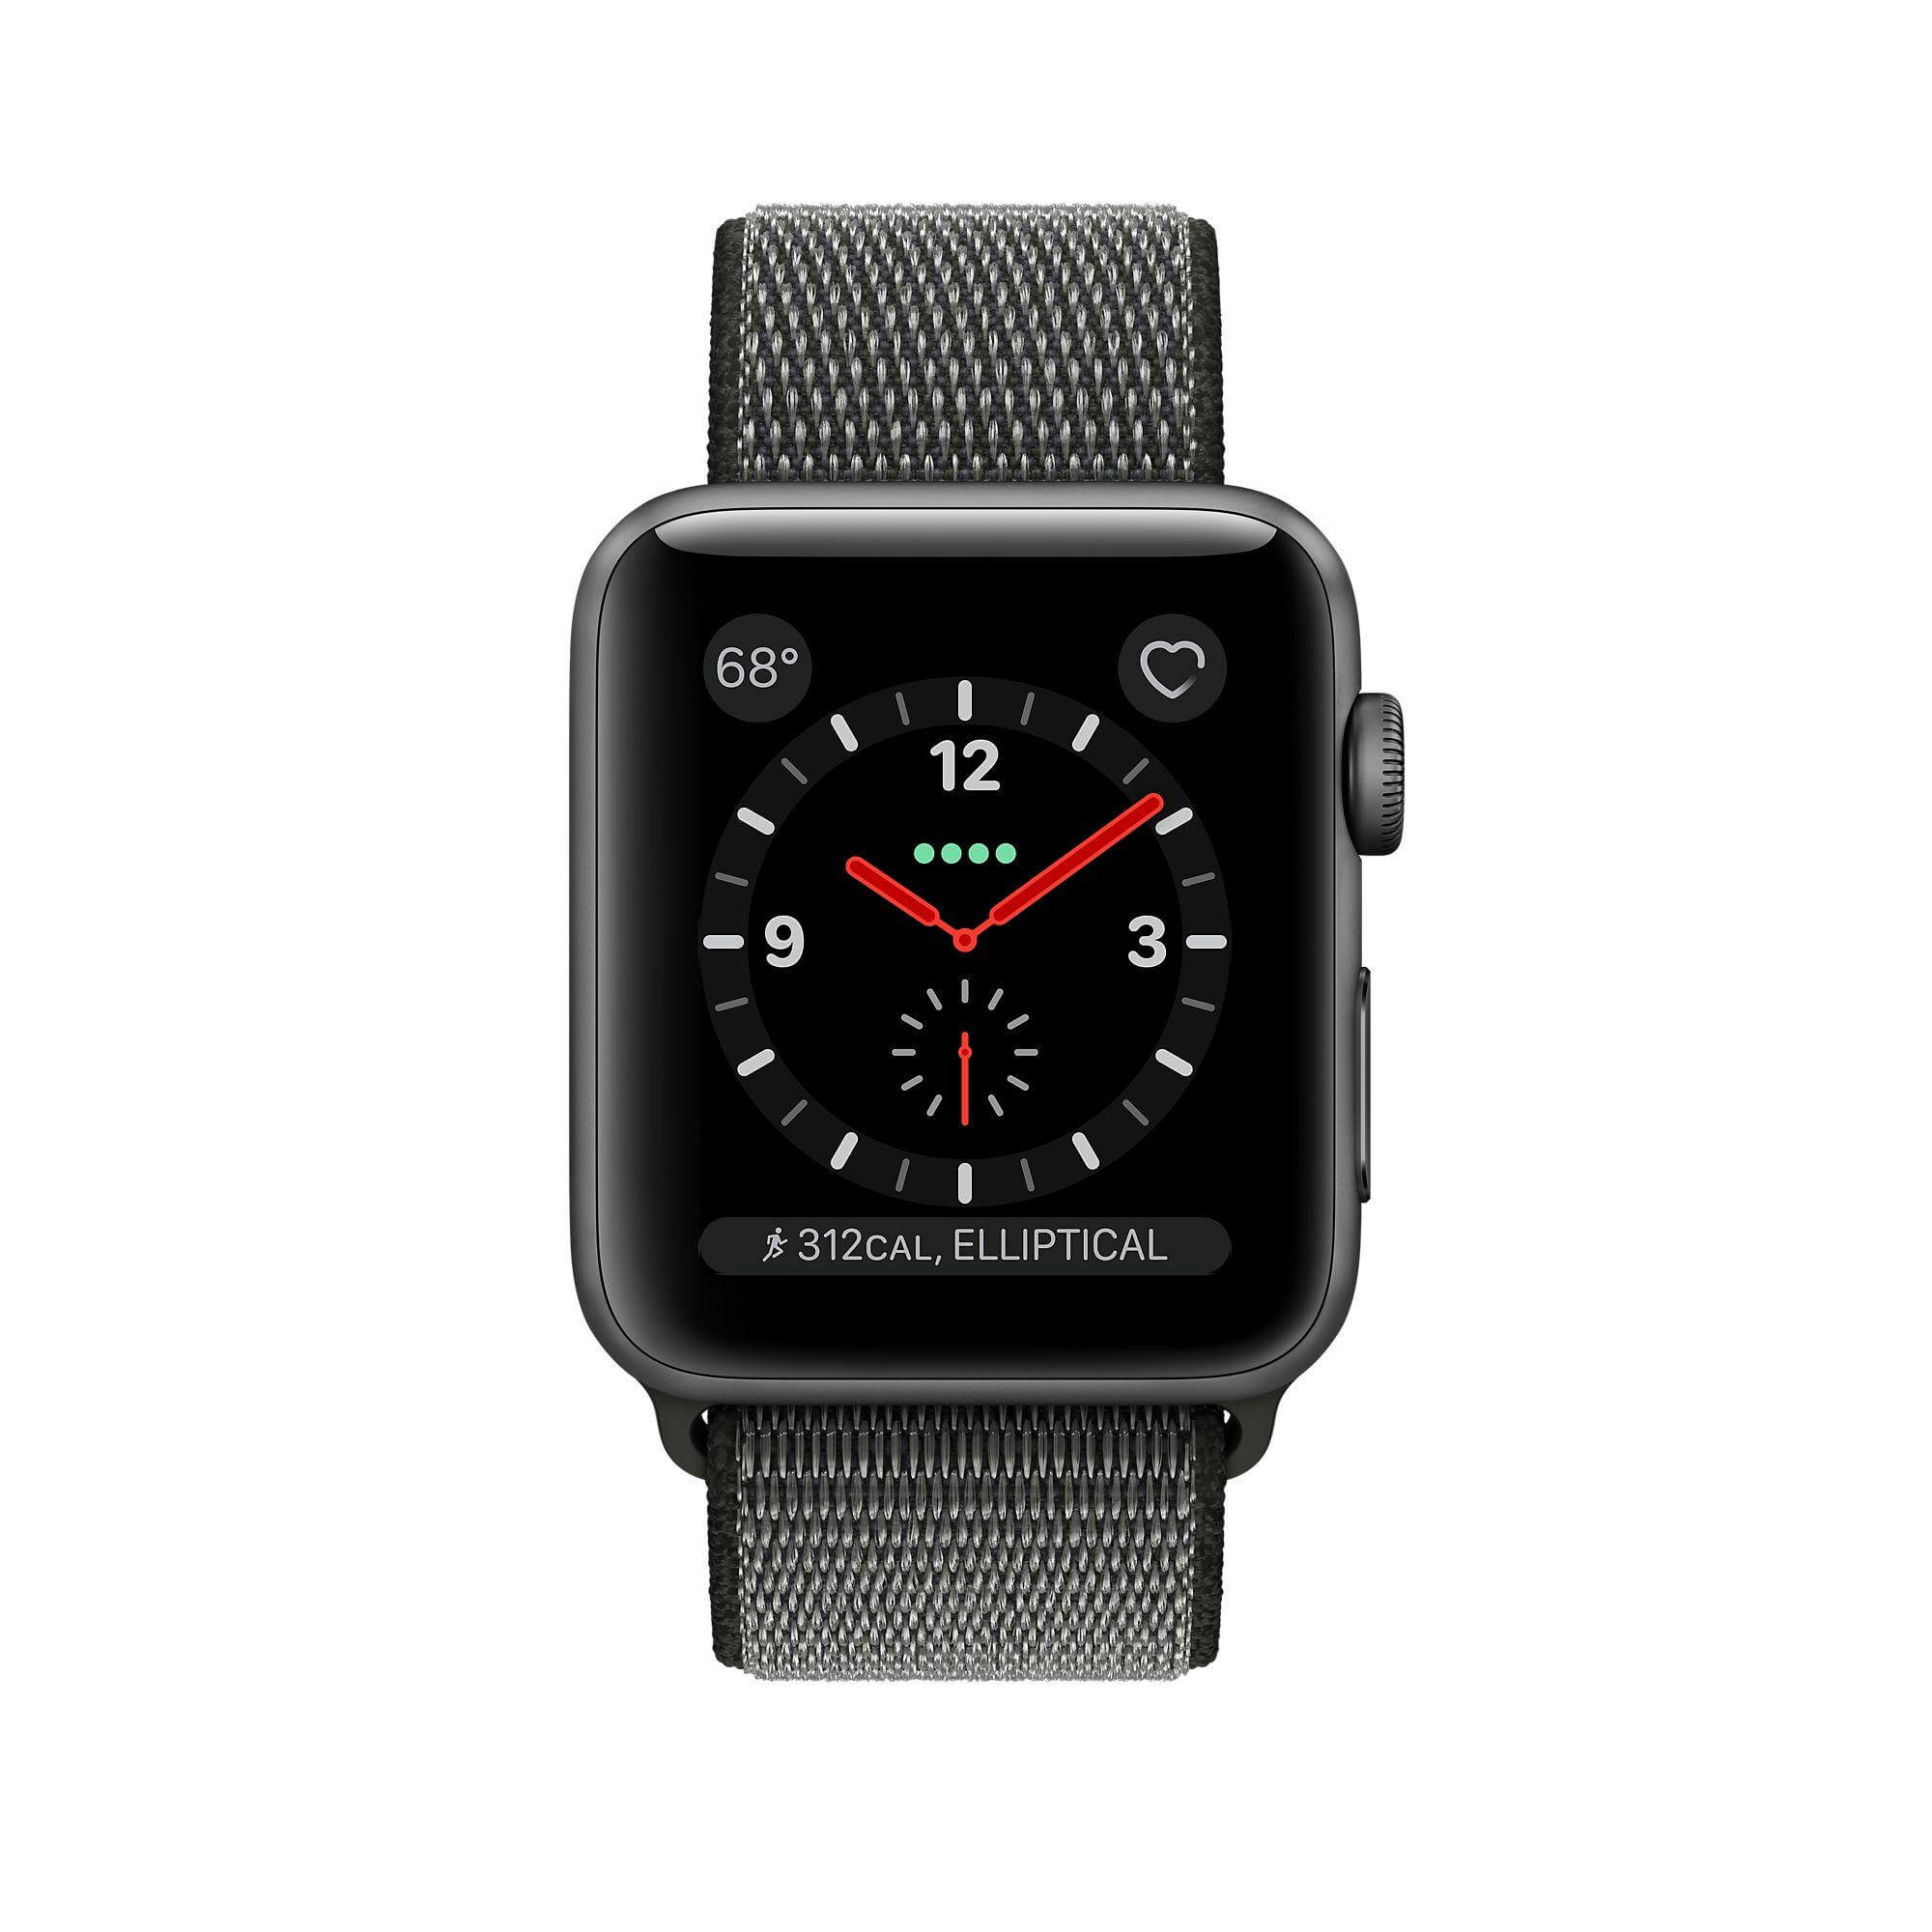 promo code a93d1 dd816 Apple Watch Space Gray Aluminum Dark Olive Sport Loop